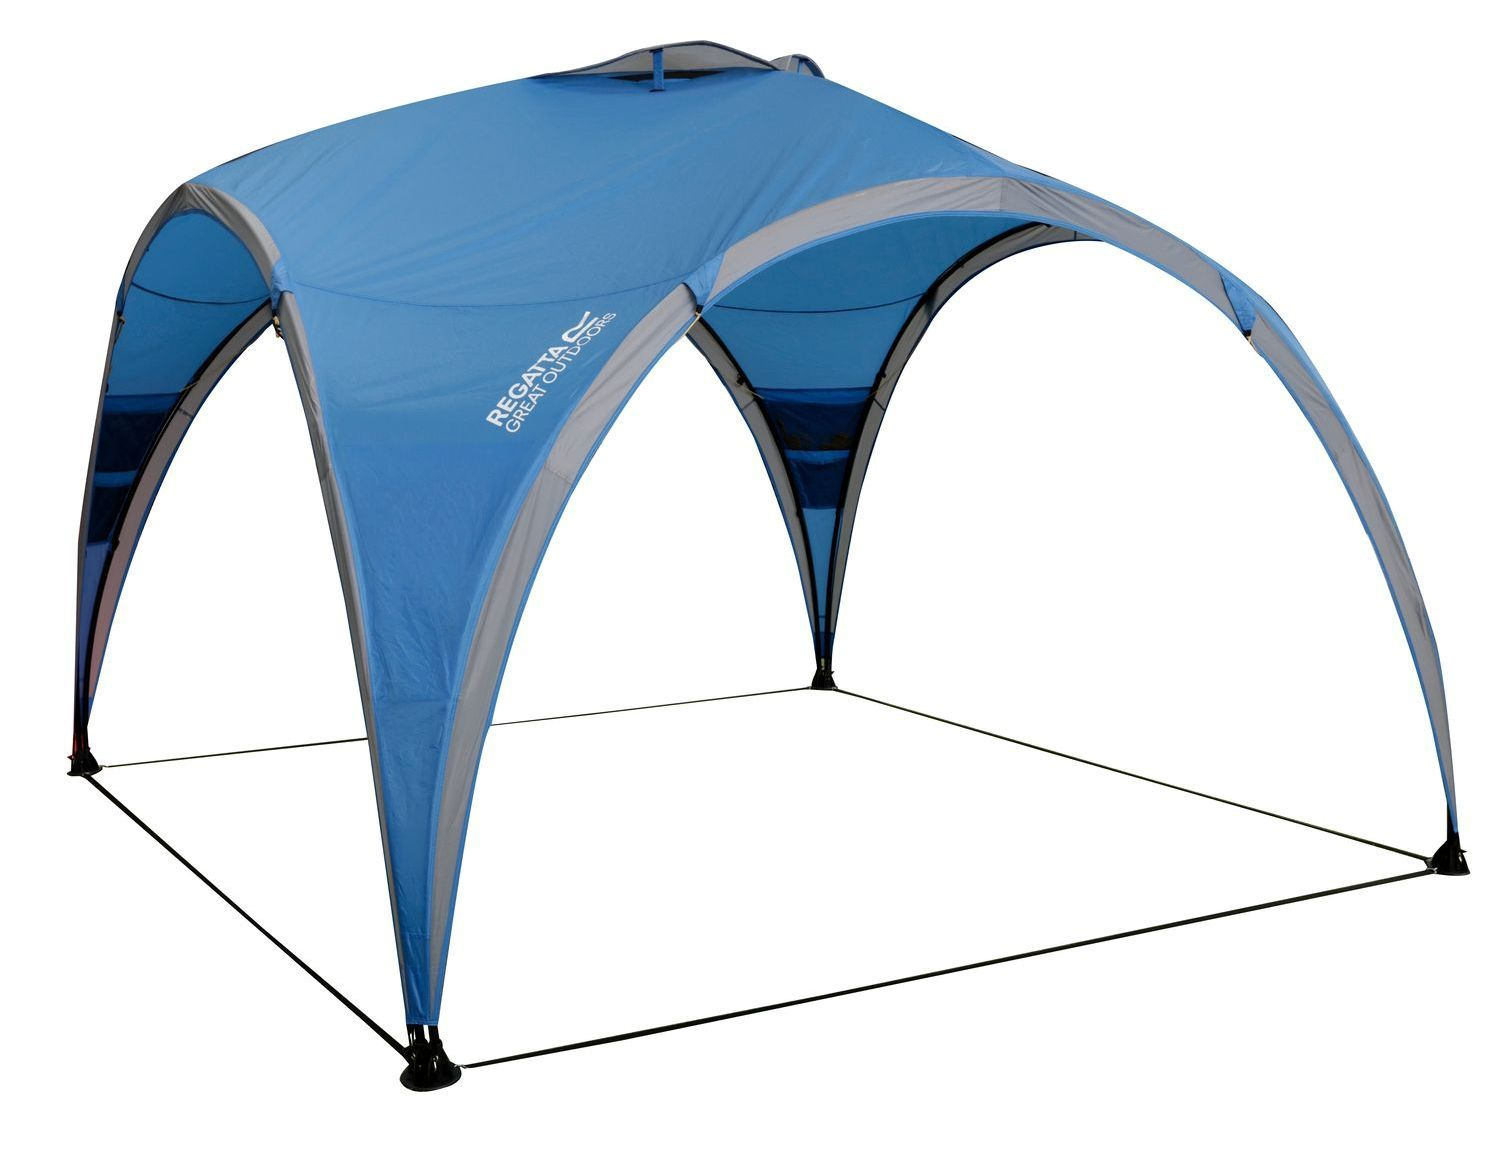 Regatta 3m x 3m Family Gazebo Shelter  sc 1 st  Wow C&ing & Regatta 3m x 3m Family Gazebo Shelter - Wow Camping